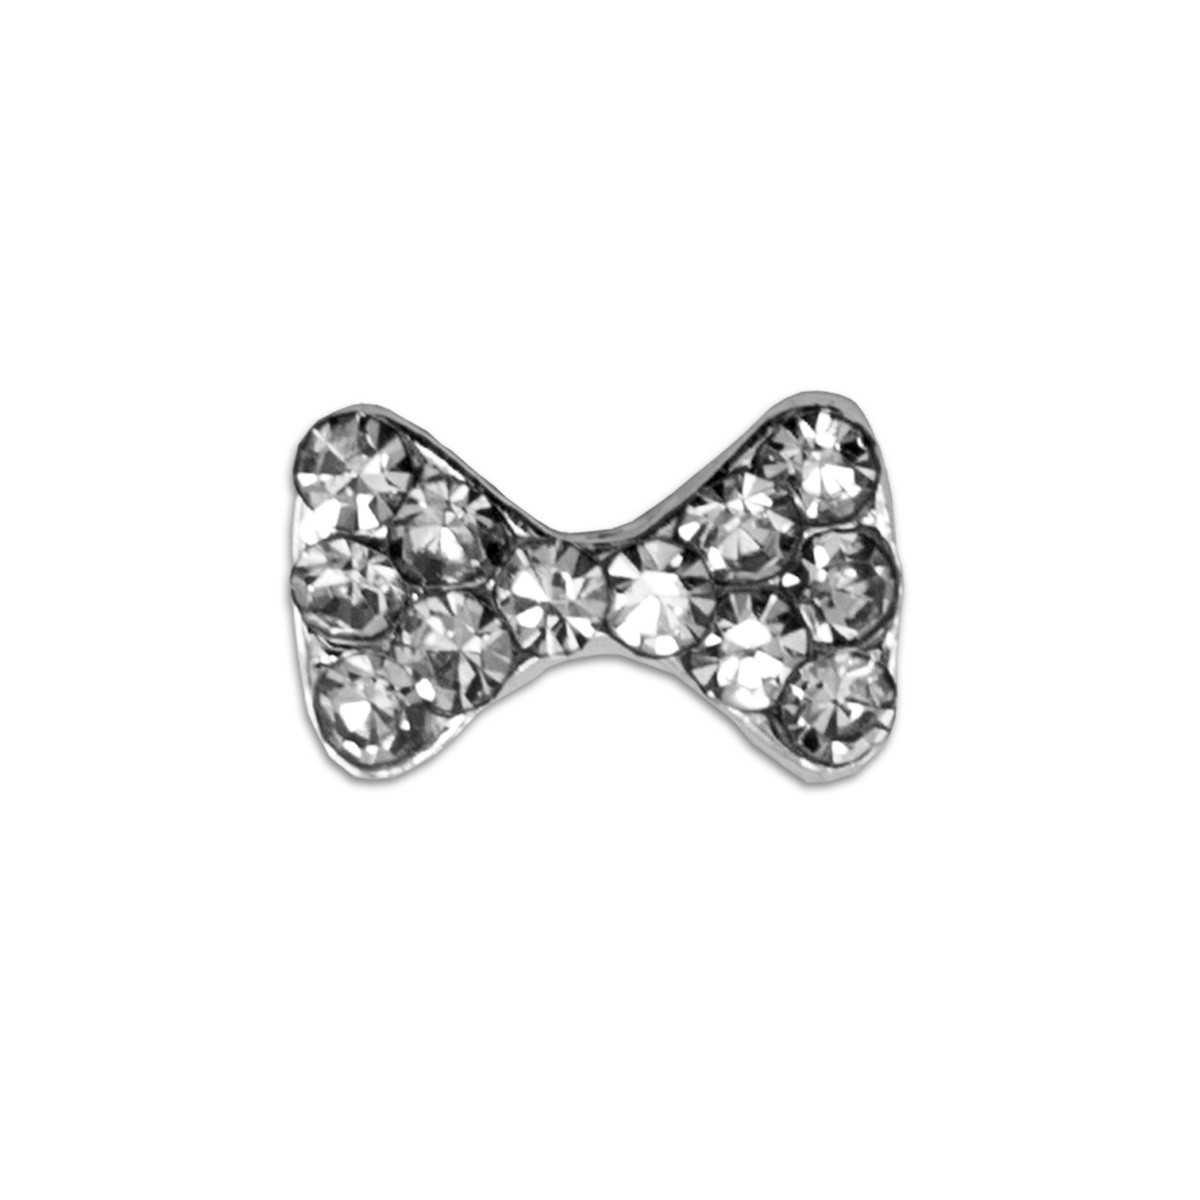 https://www.kit-manucure.com/1583-thickbox_default/bijoux-pour-ongles-noeud-argent-et-strass.jpg